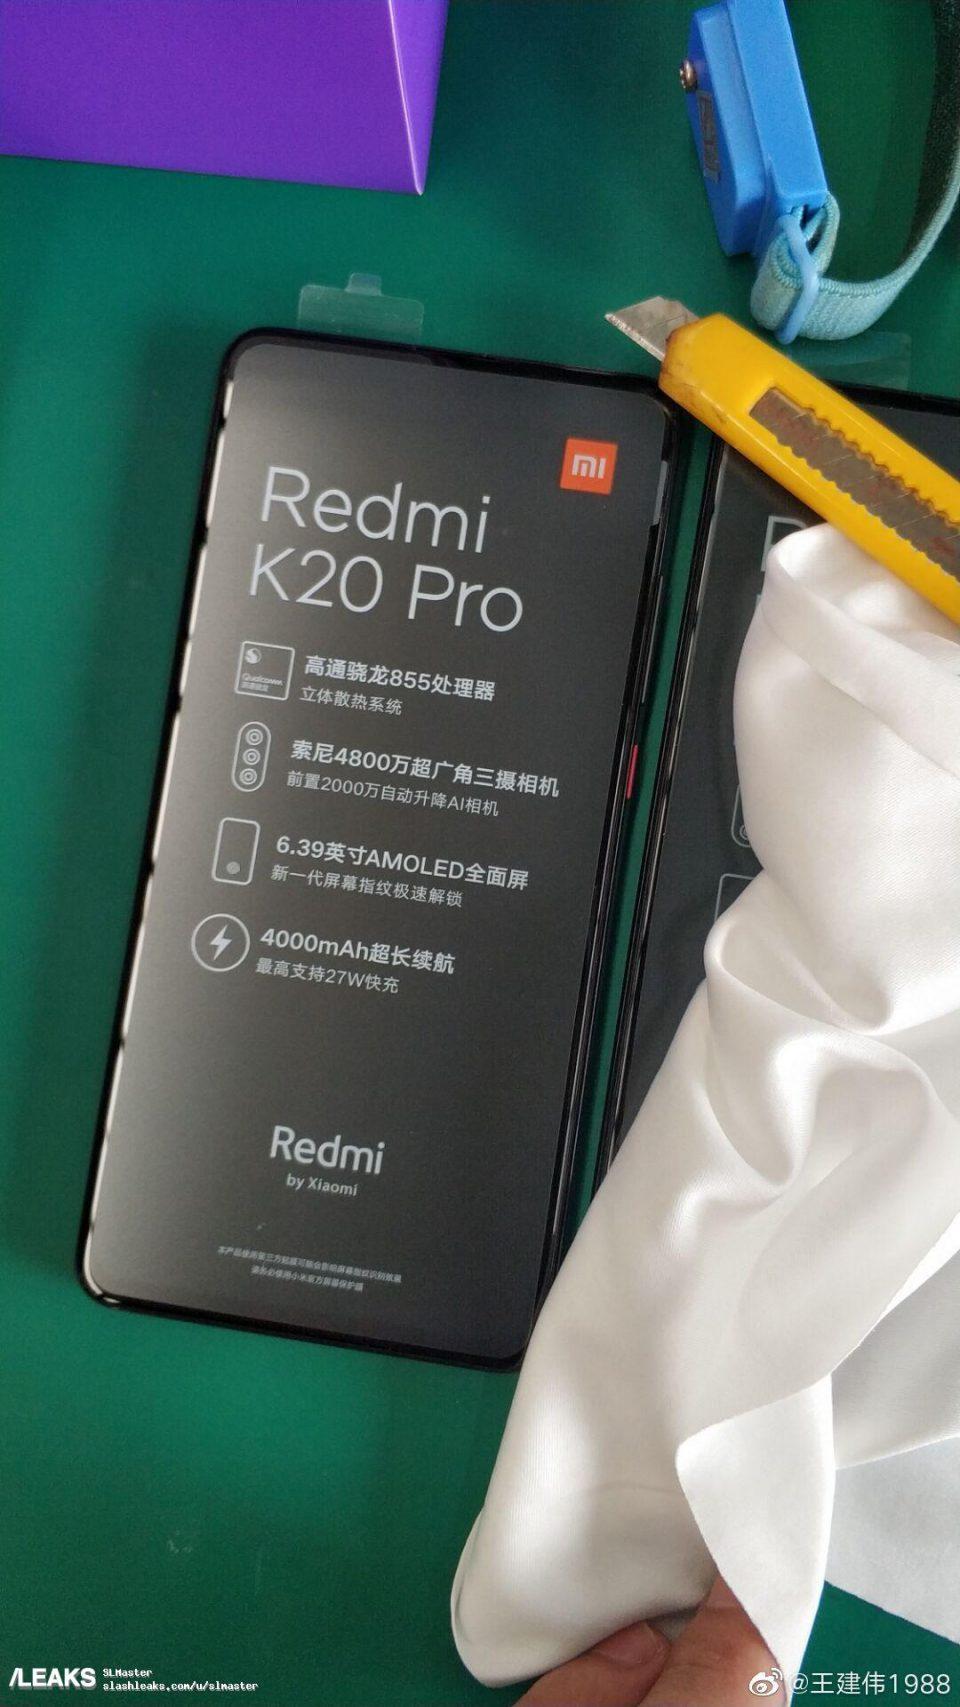 Redmi K20 Pro | Evosmart.it